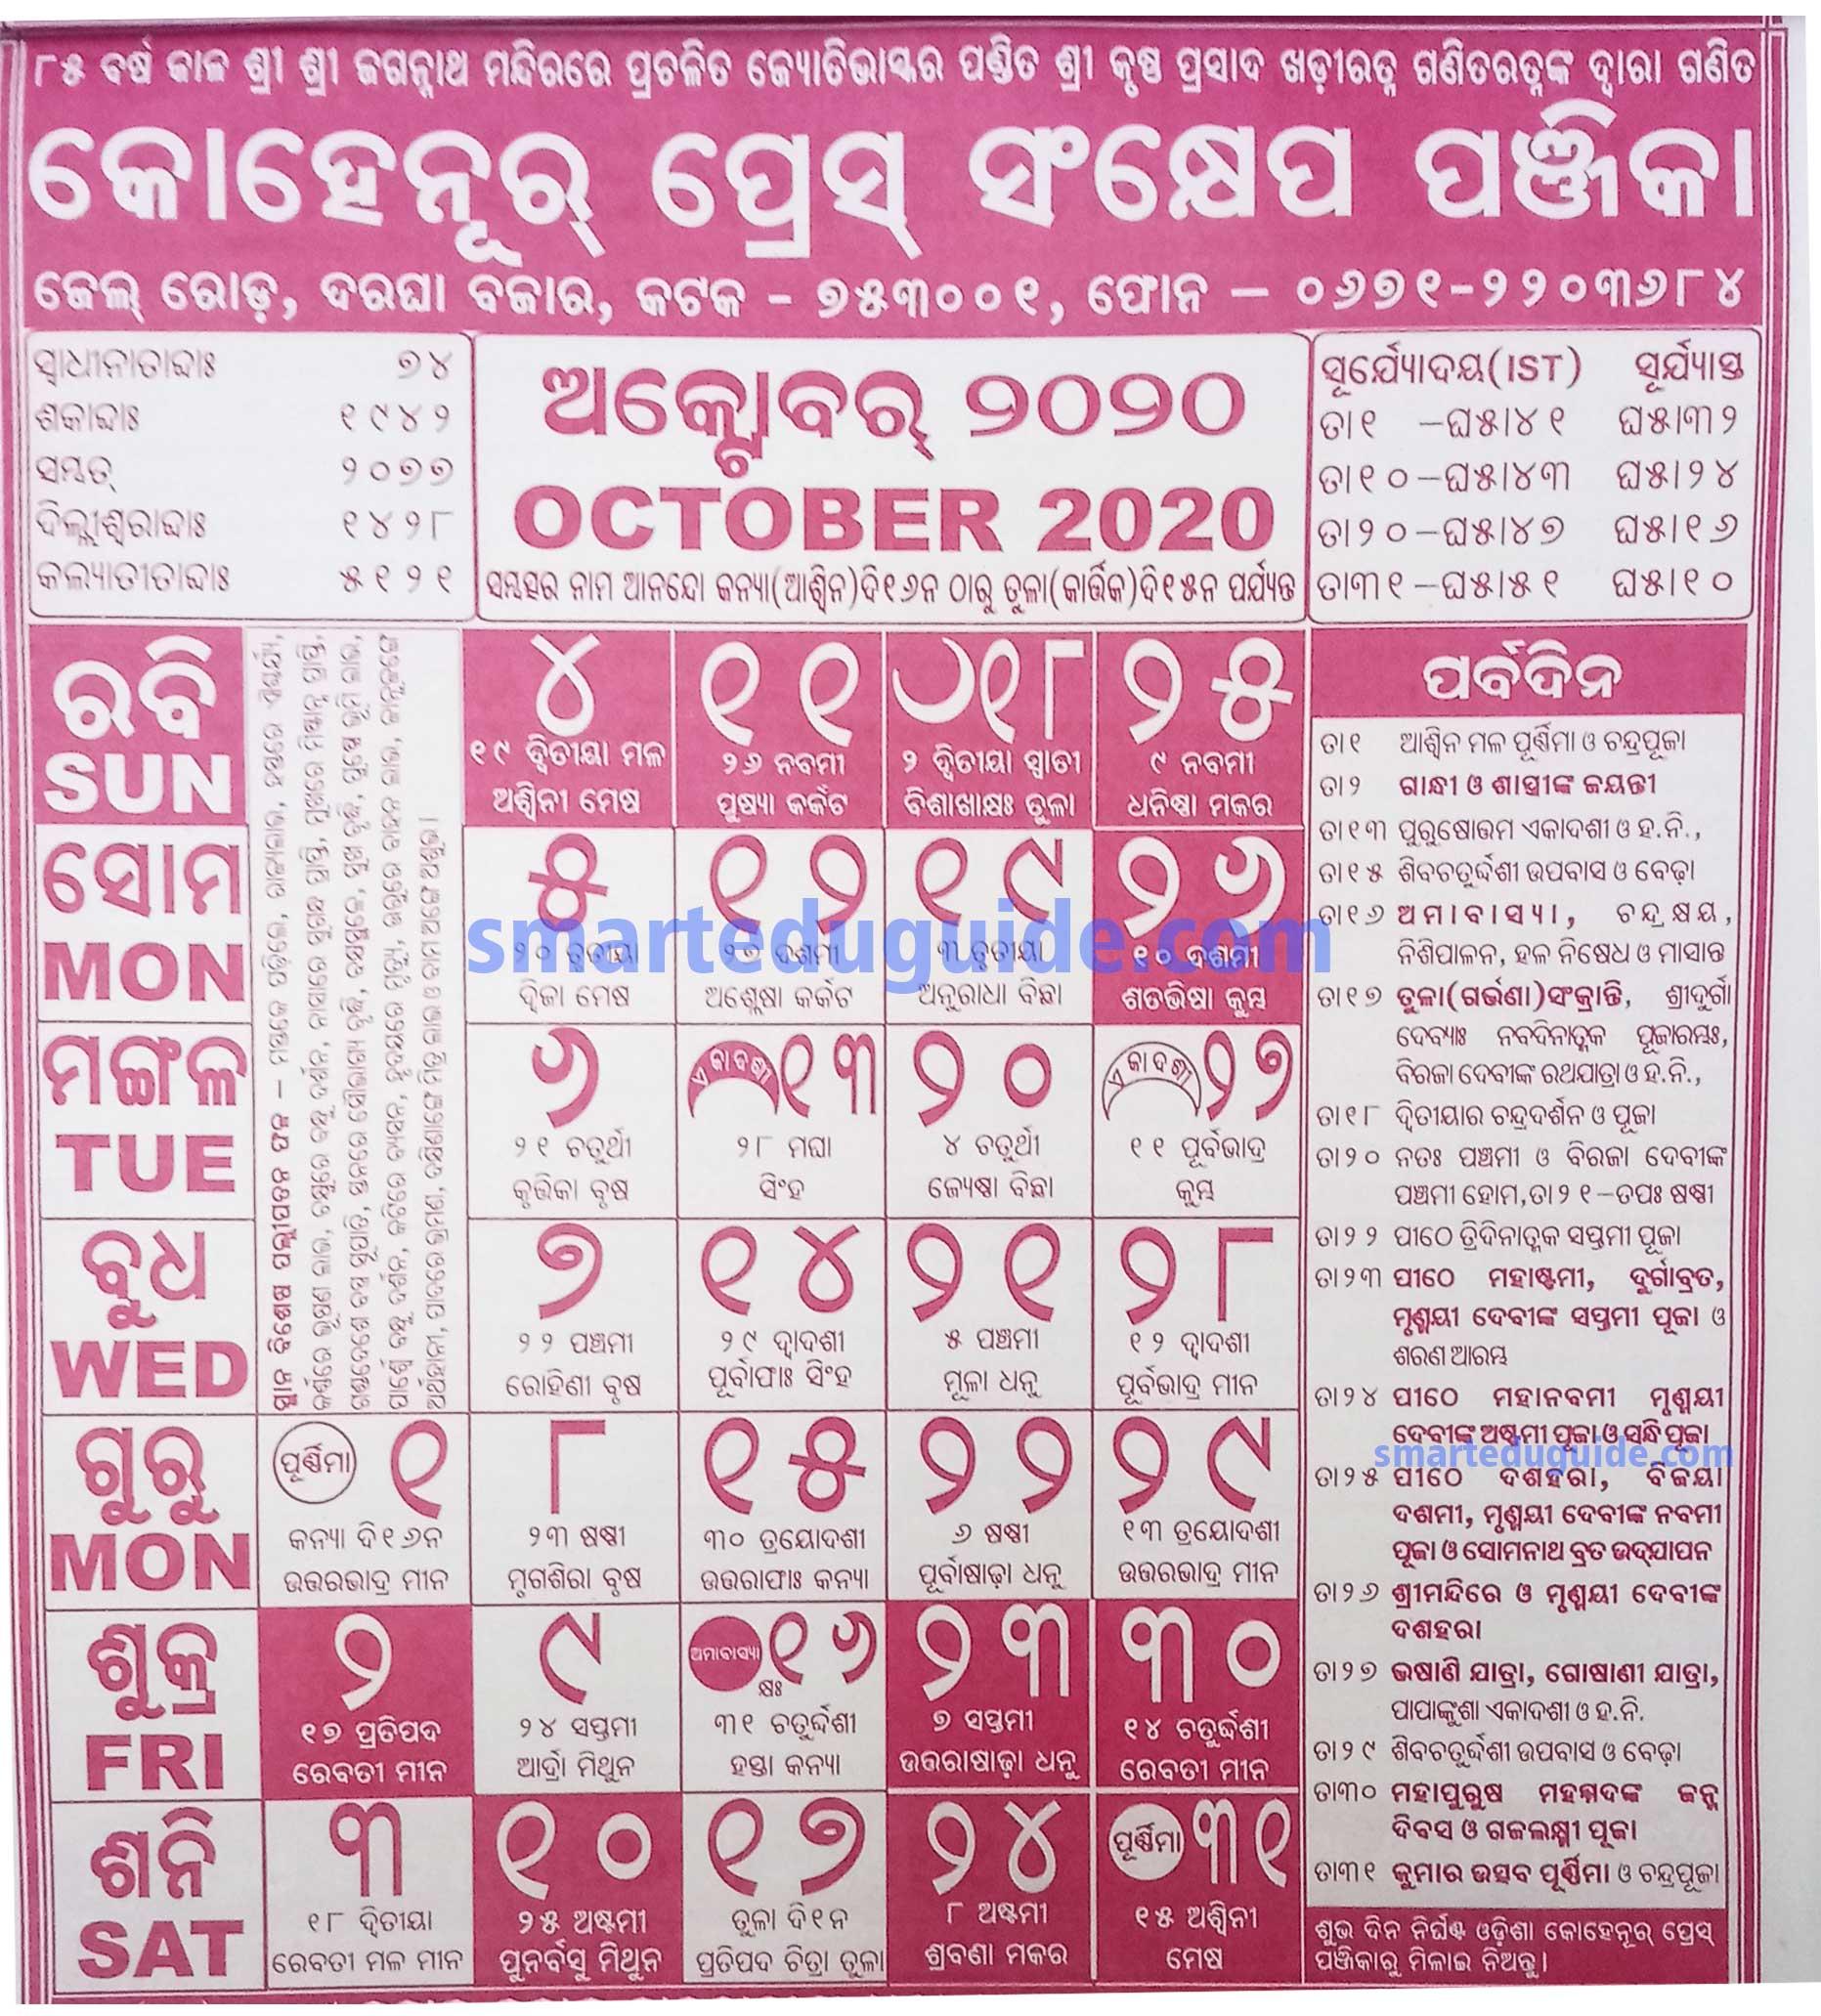 Odia Kohinoor Calendar 2020 October | Odishain pertaining to Odia Calendar January 2020